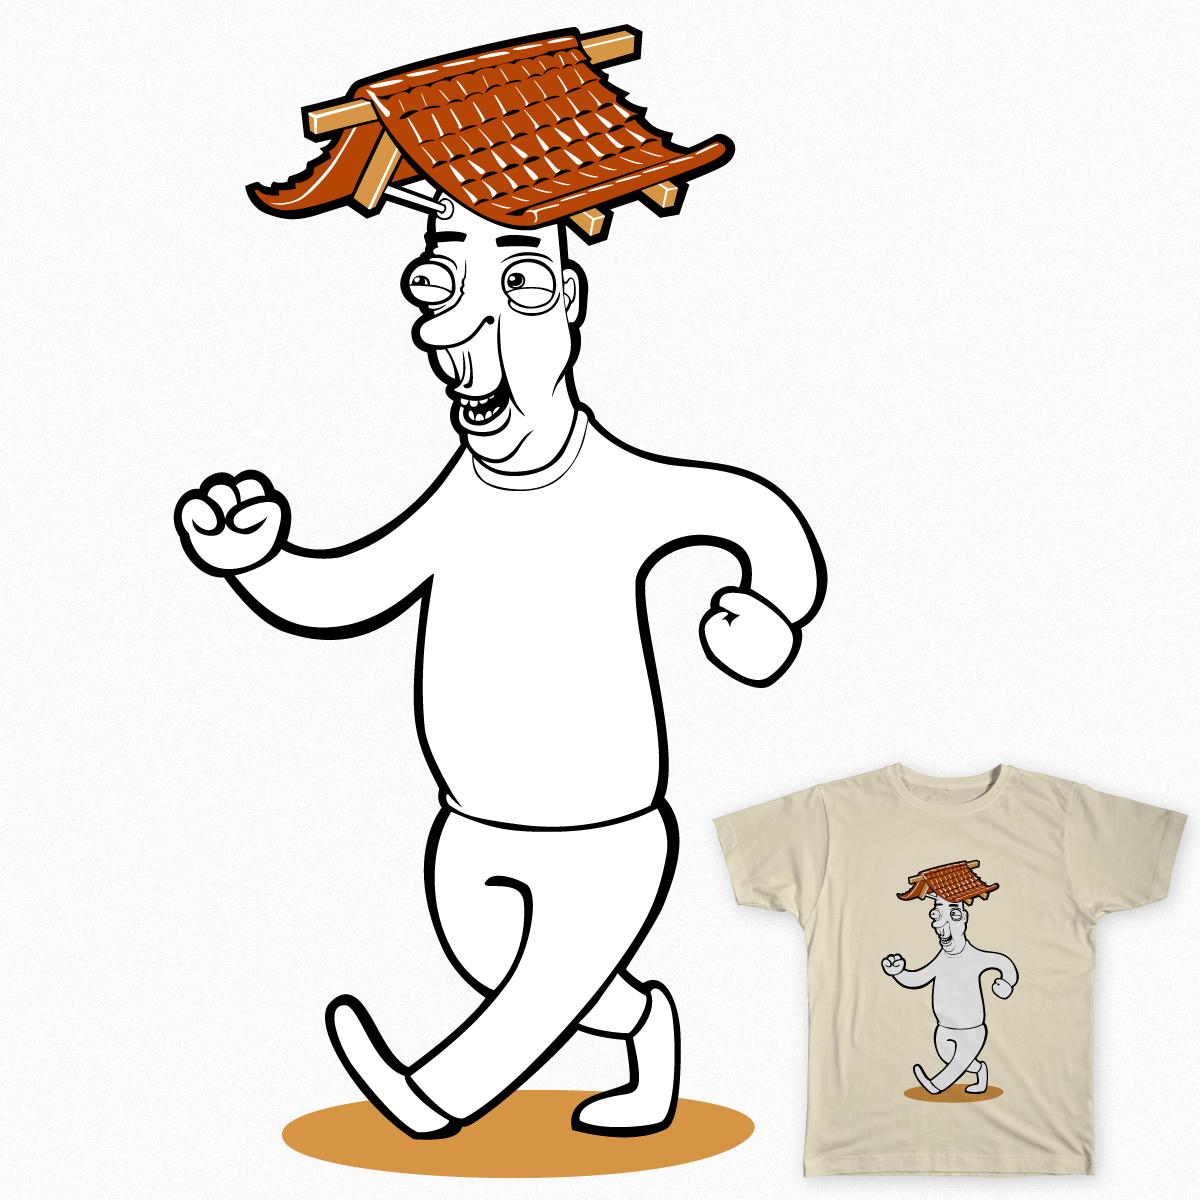 Wherever I Lay my Hat by partalarvi on Threadless